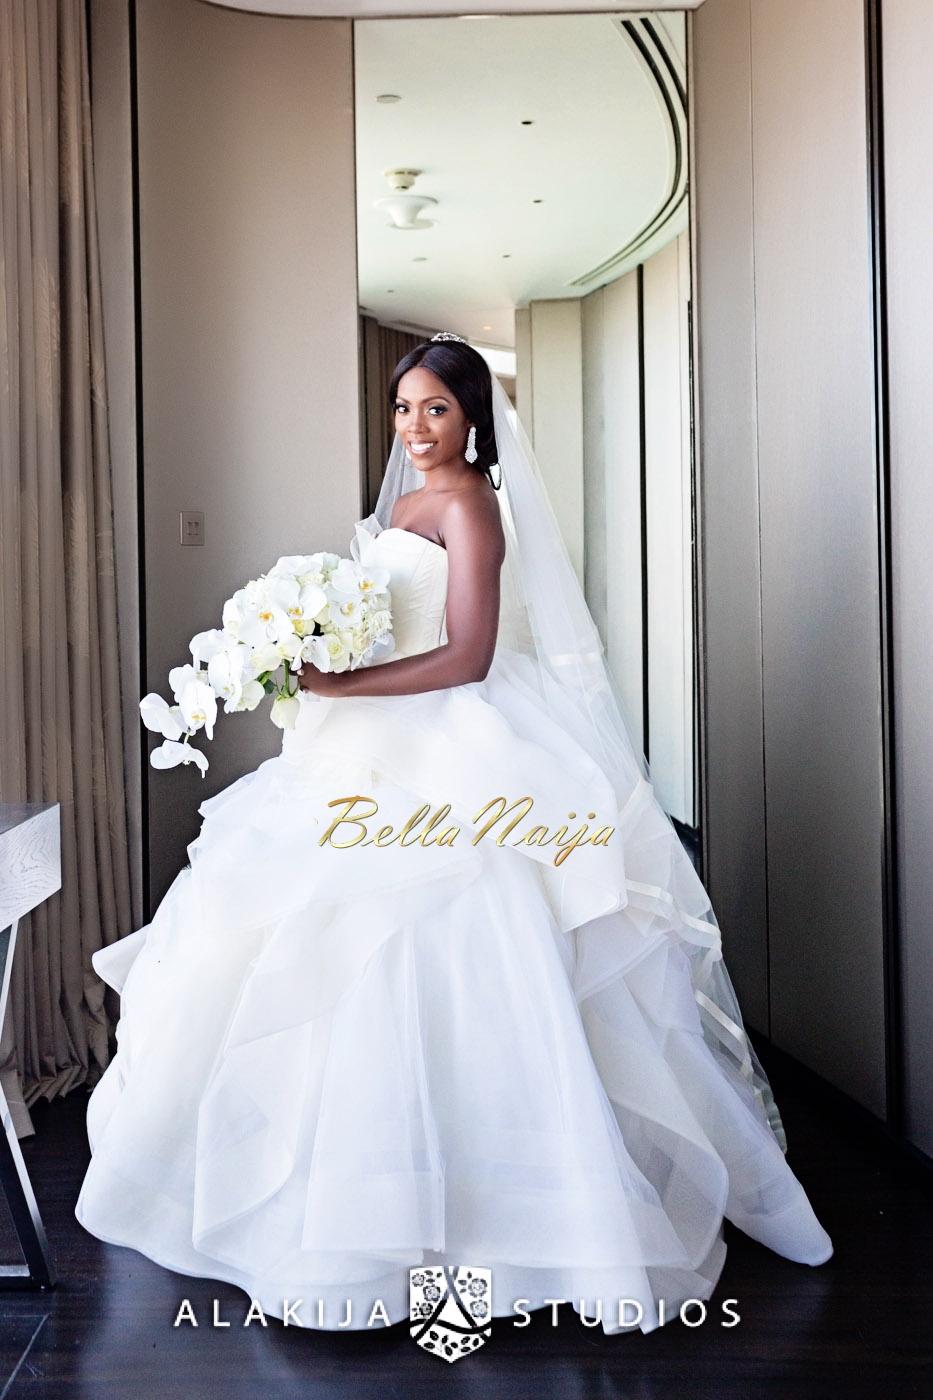 Tiwa Savage Wedding Dress Alakija Studios1